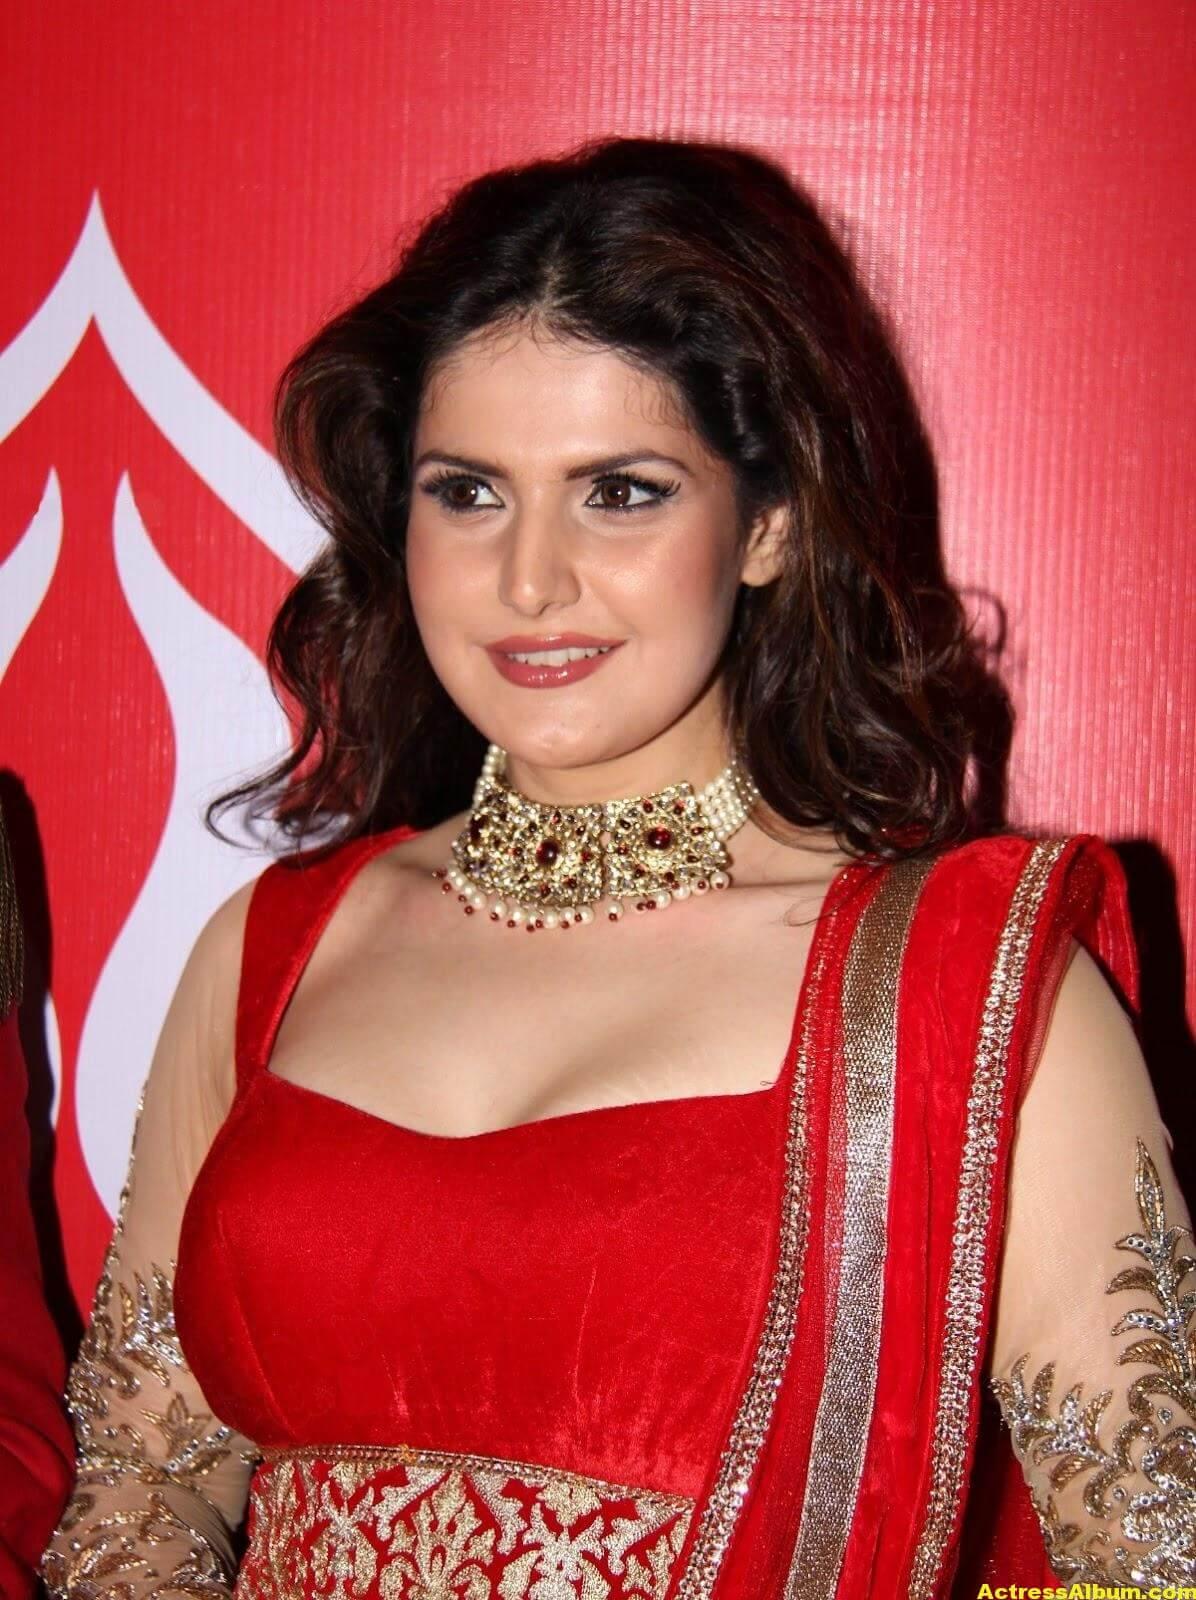 Zarine Khan In Red Dress